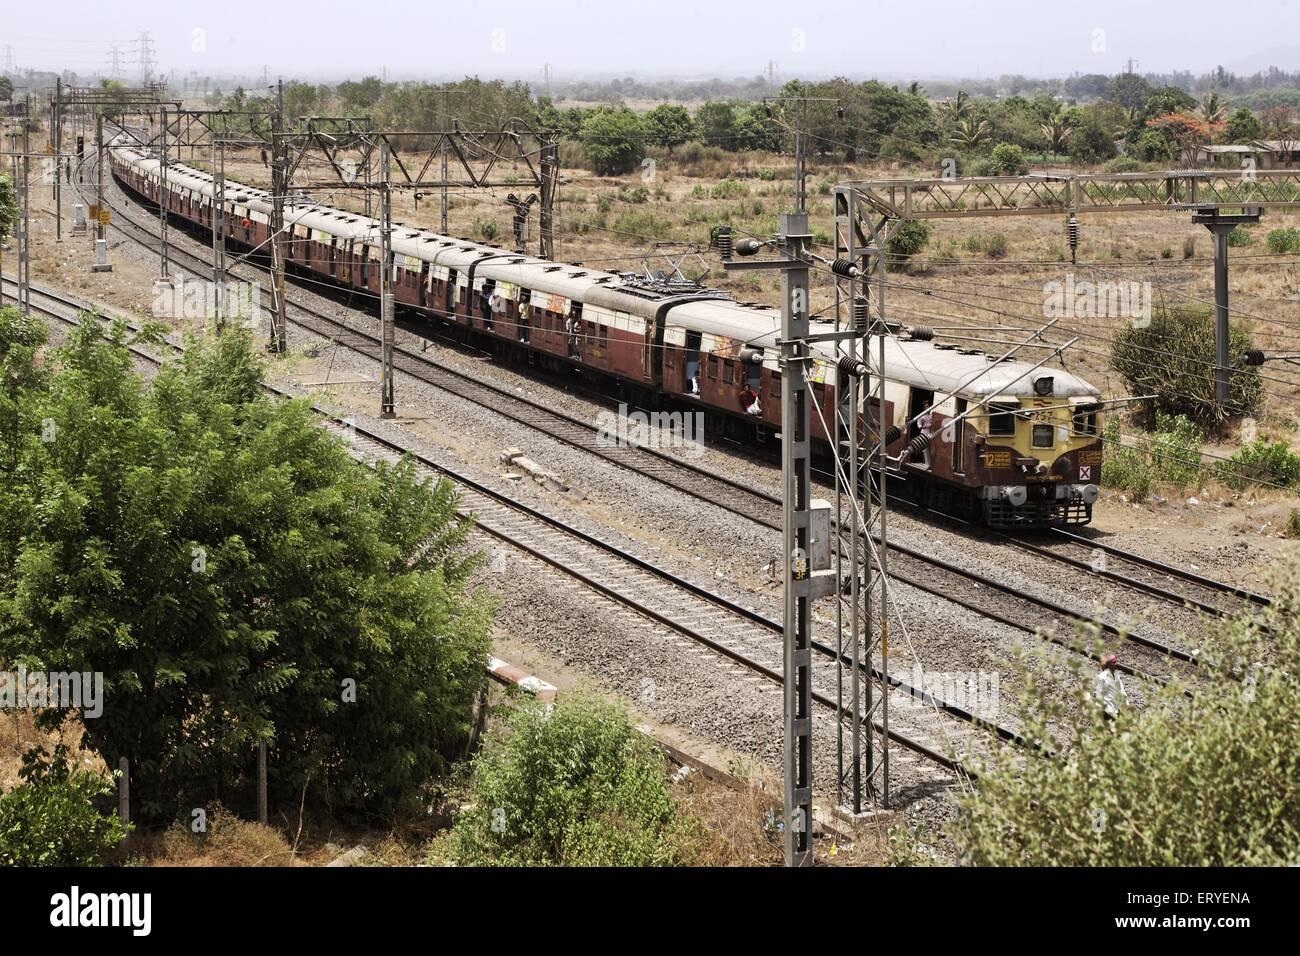 Suburban electric train ; Maharashtra ; India Stock Photo